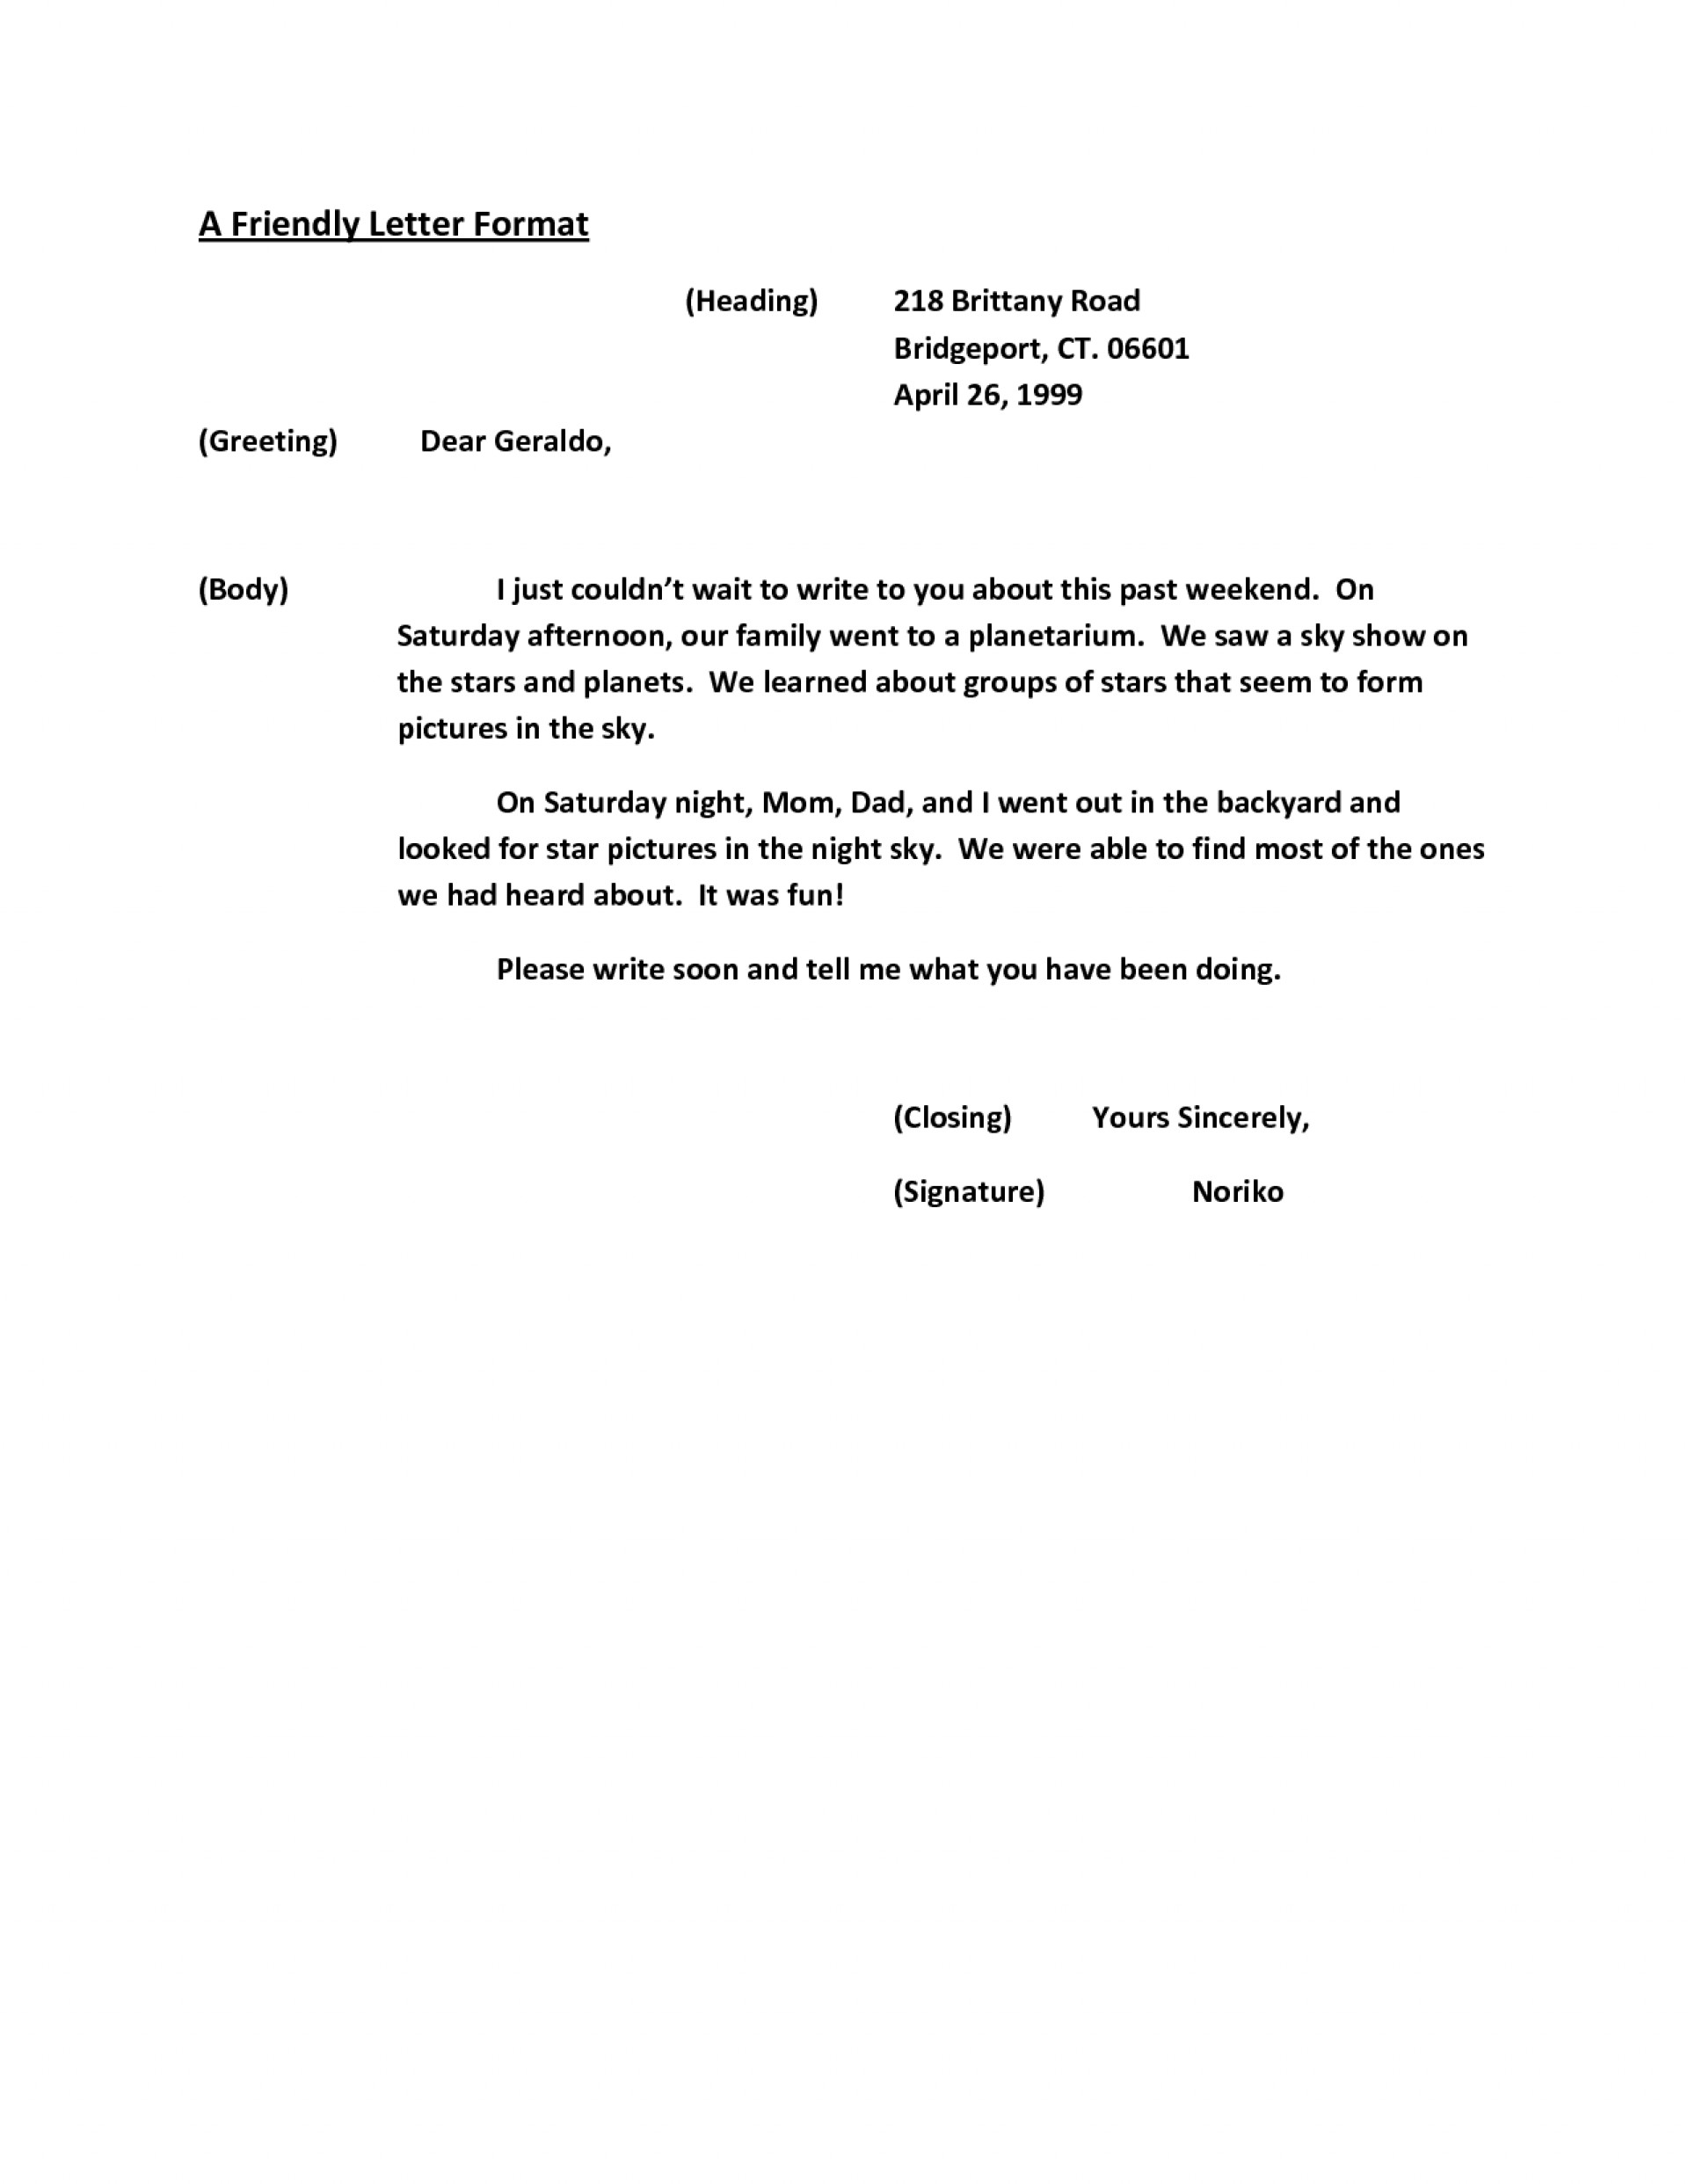 019 Essay Example Friendly Letter Format Mwvacqzf Phenomenal Header Mla Paper Margins 1920